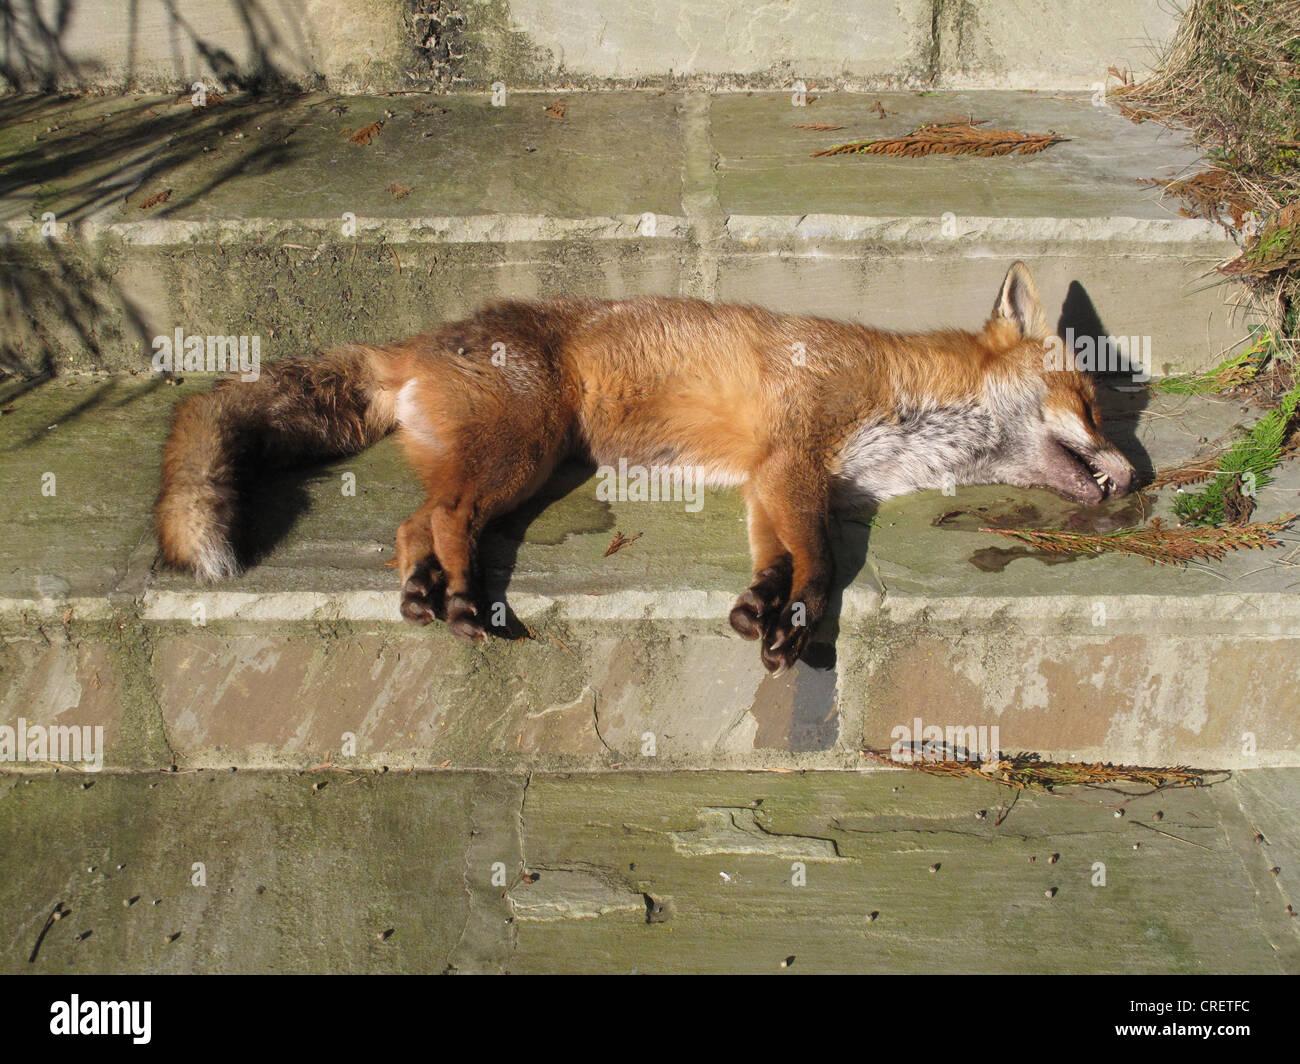 Dead Fox Uk Stock Photos & Dead Fox Uk Stock Images - Alamy